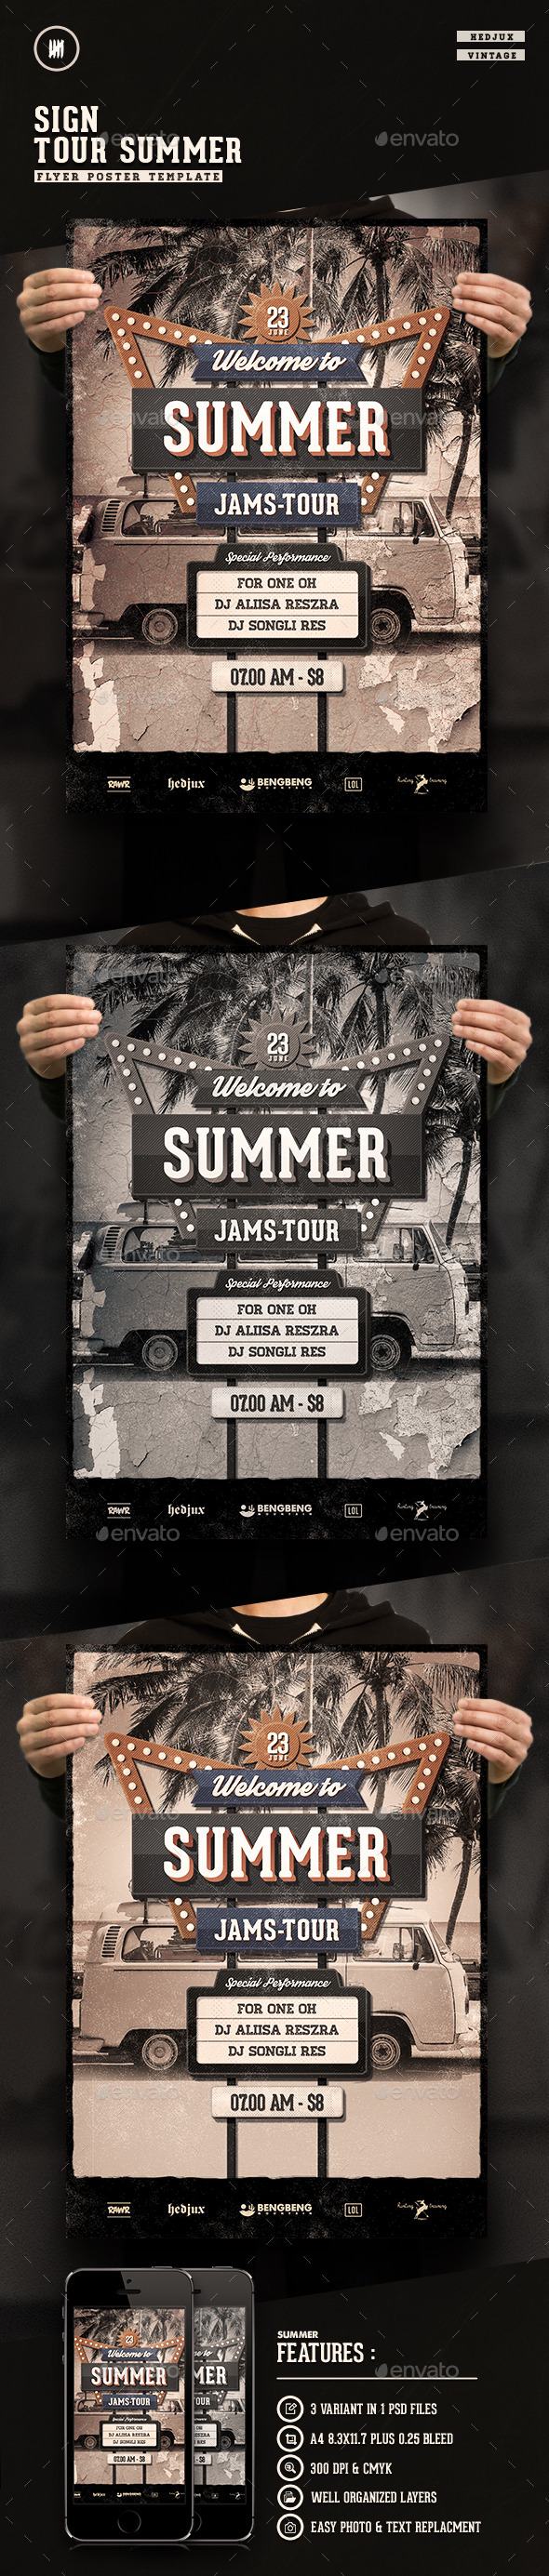 GraphicRiver Summer Tour Sign Flyer 11893866